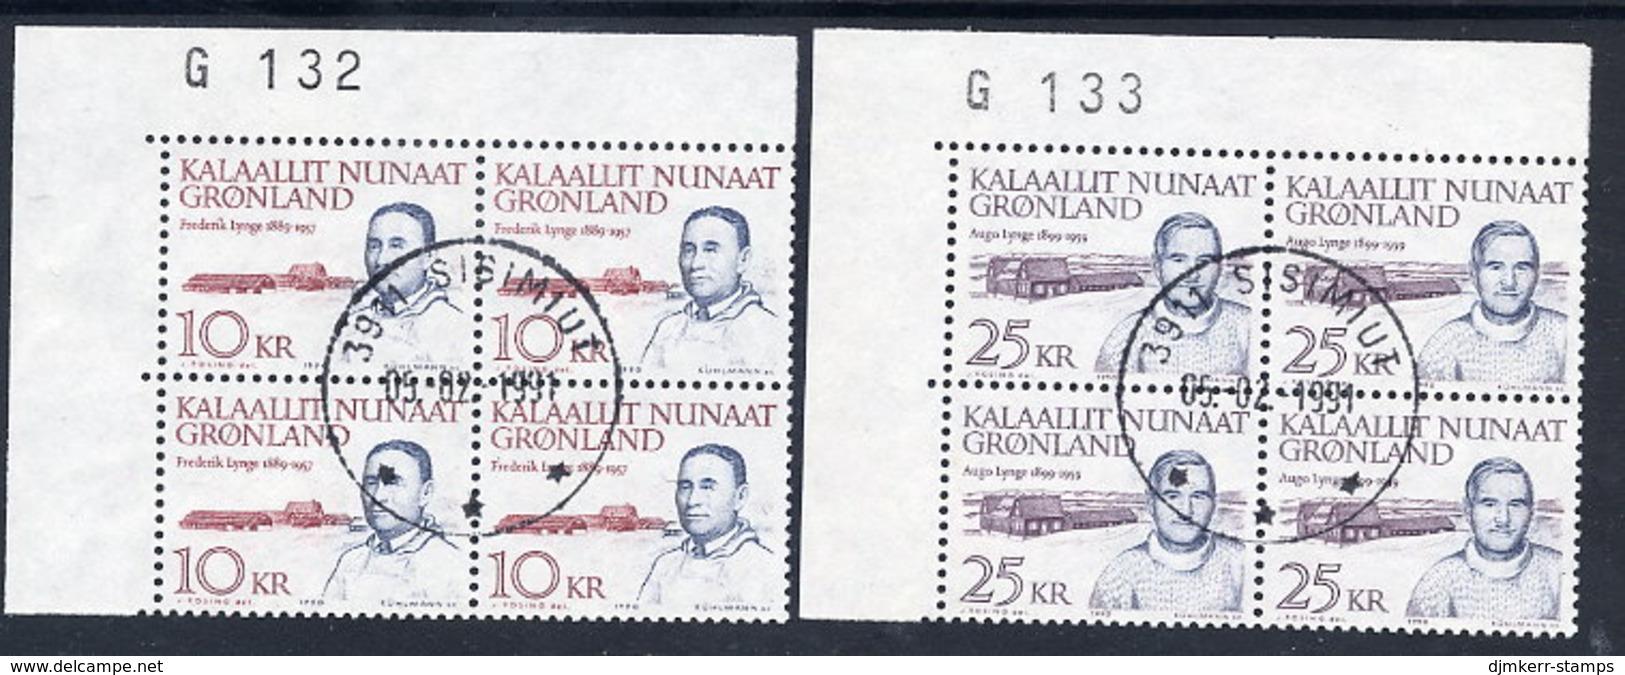 GREENLAND 1990 Definitive: Personalities In Used Corner Blocks Of 4.  Michel 209-10 - Greenland